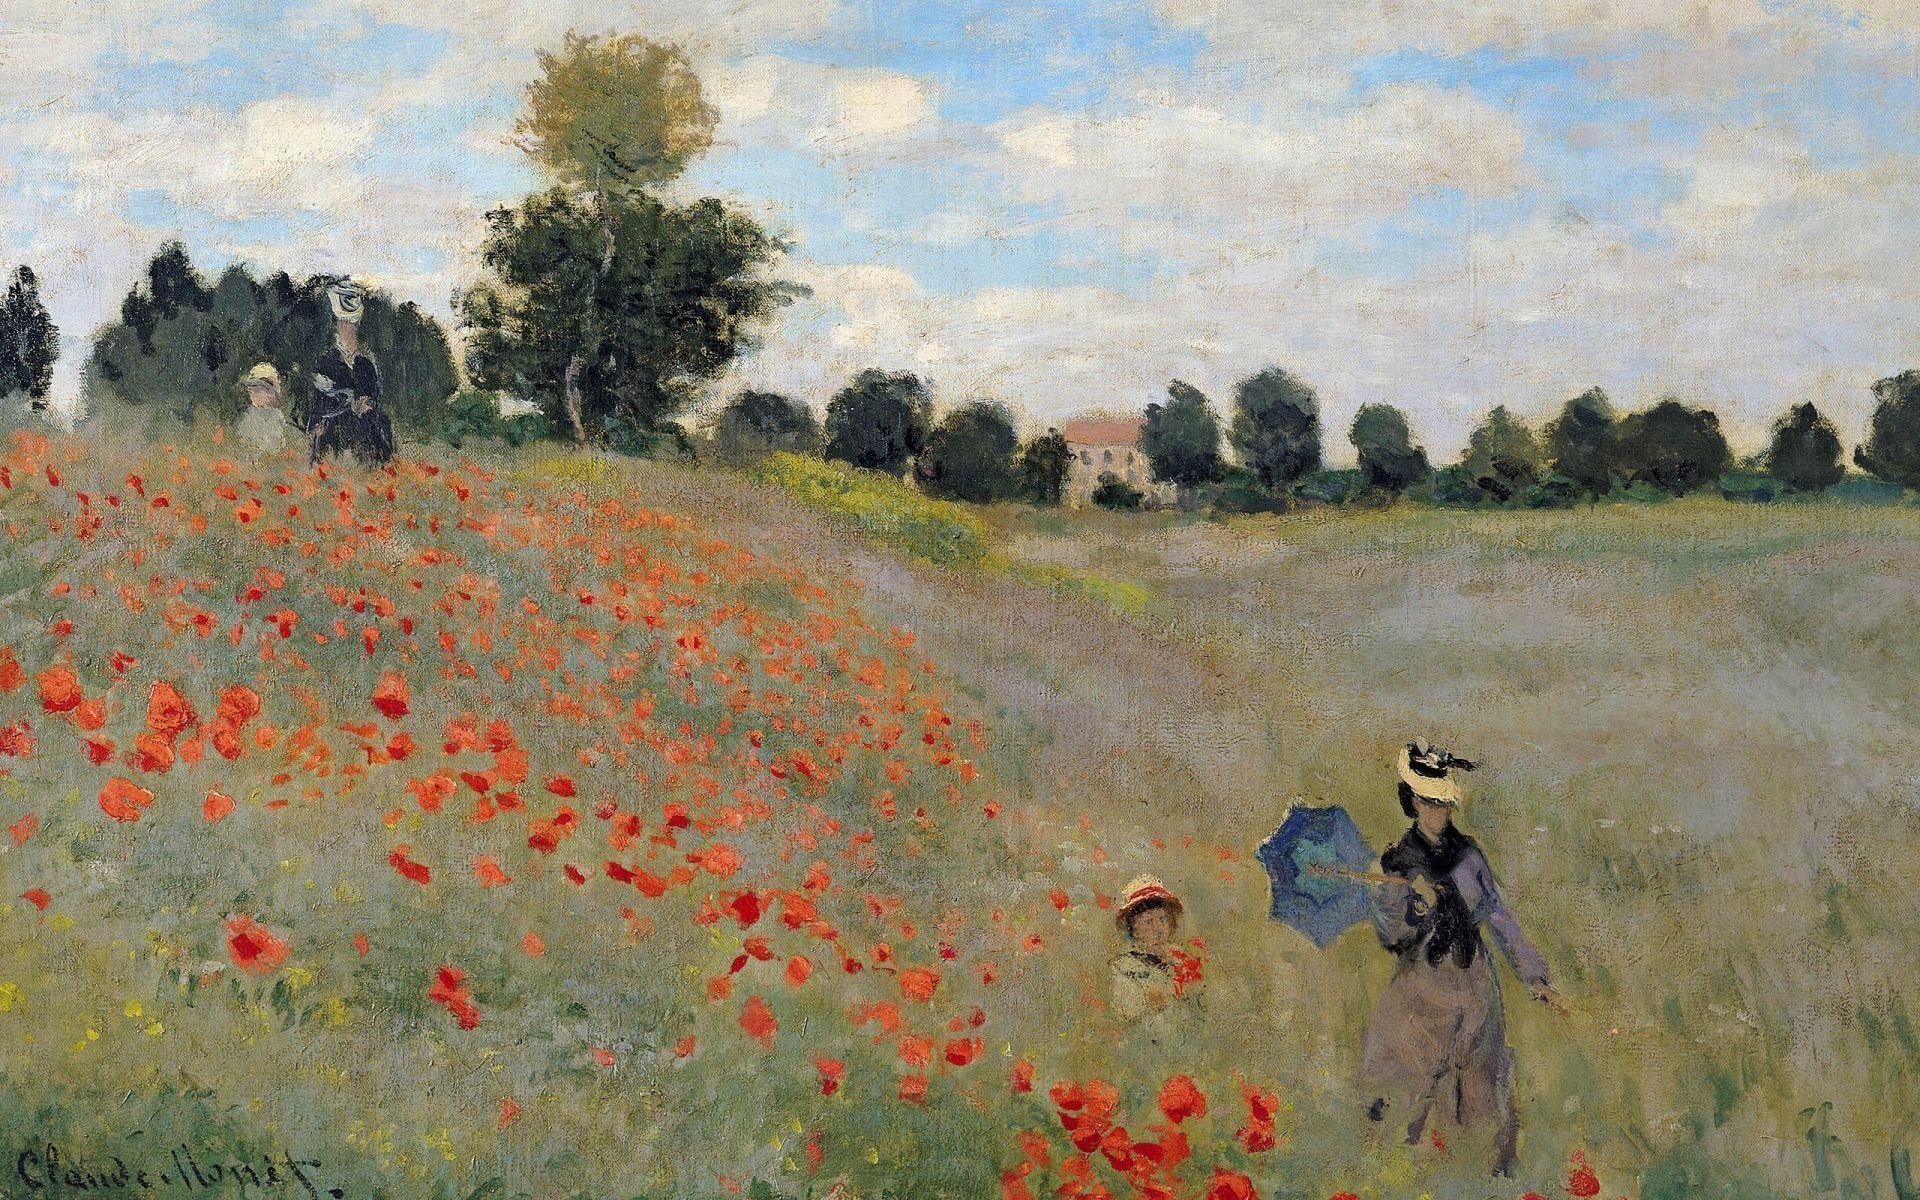 Wallpaper Wild Poppies By Claude Monet Desktop | High Quality .